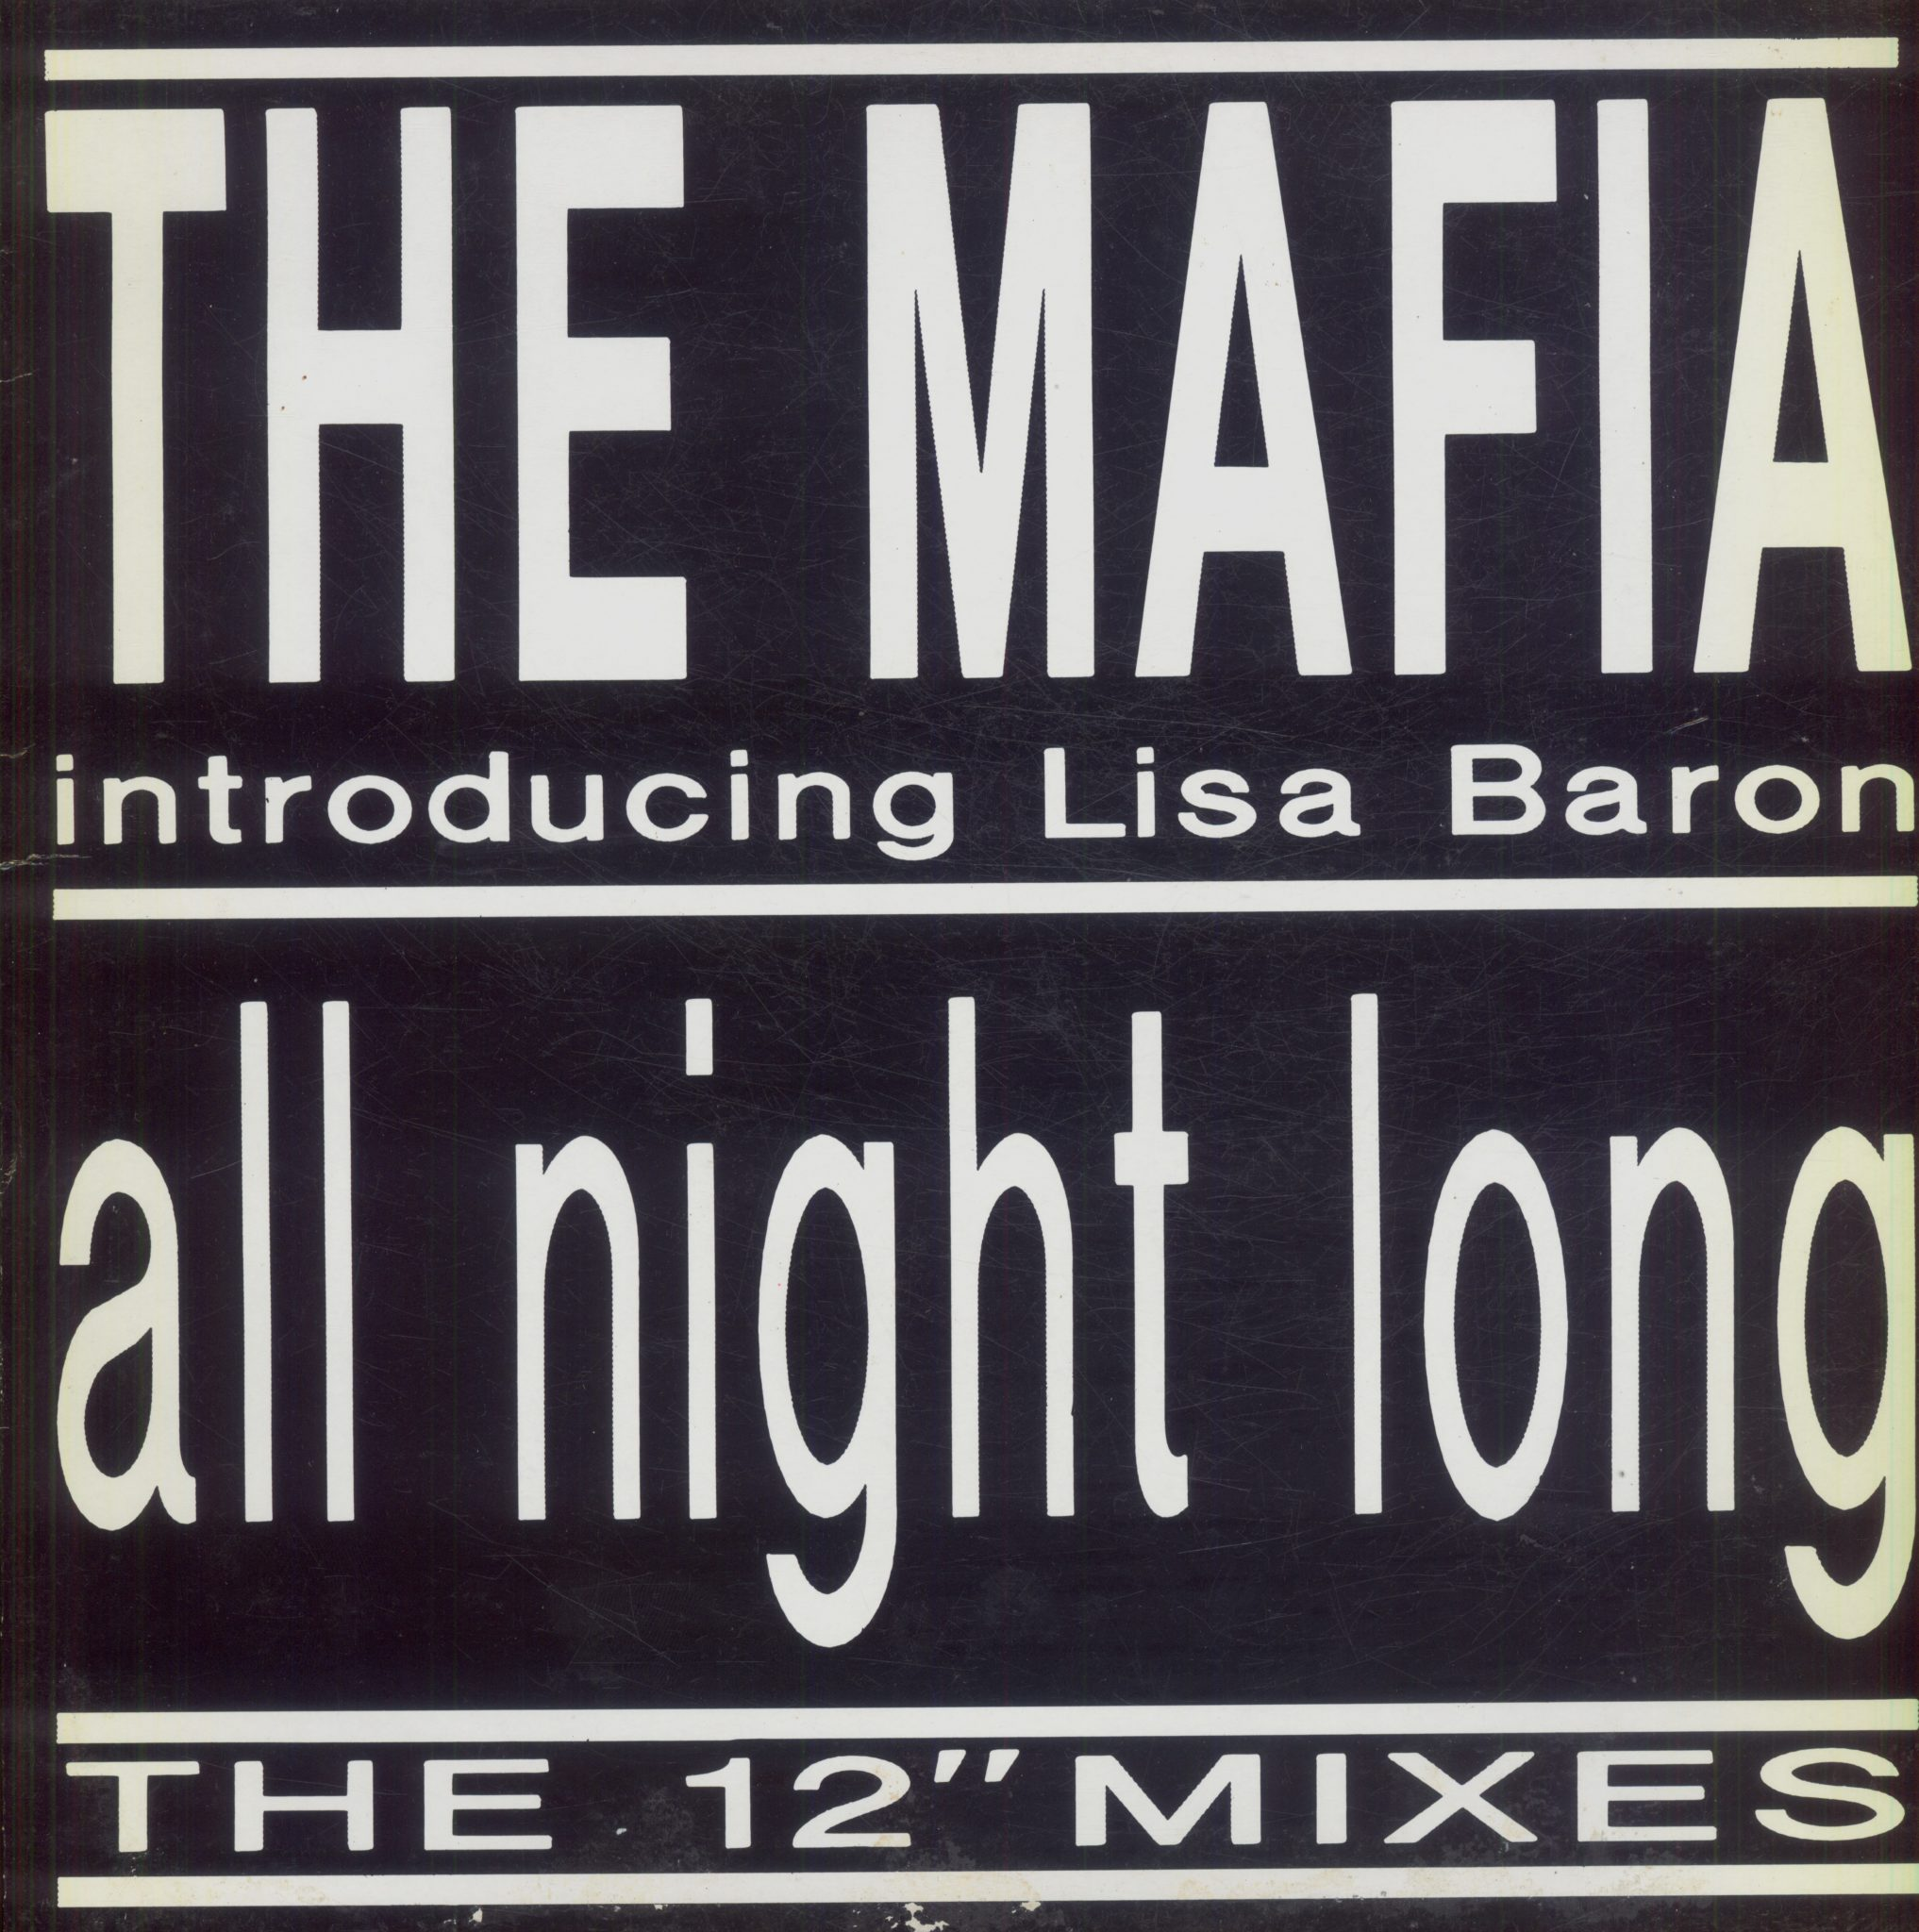 Gramofonska ploča Mafia Introducing Lisa Baron All Night Long MMX 1